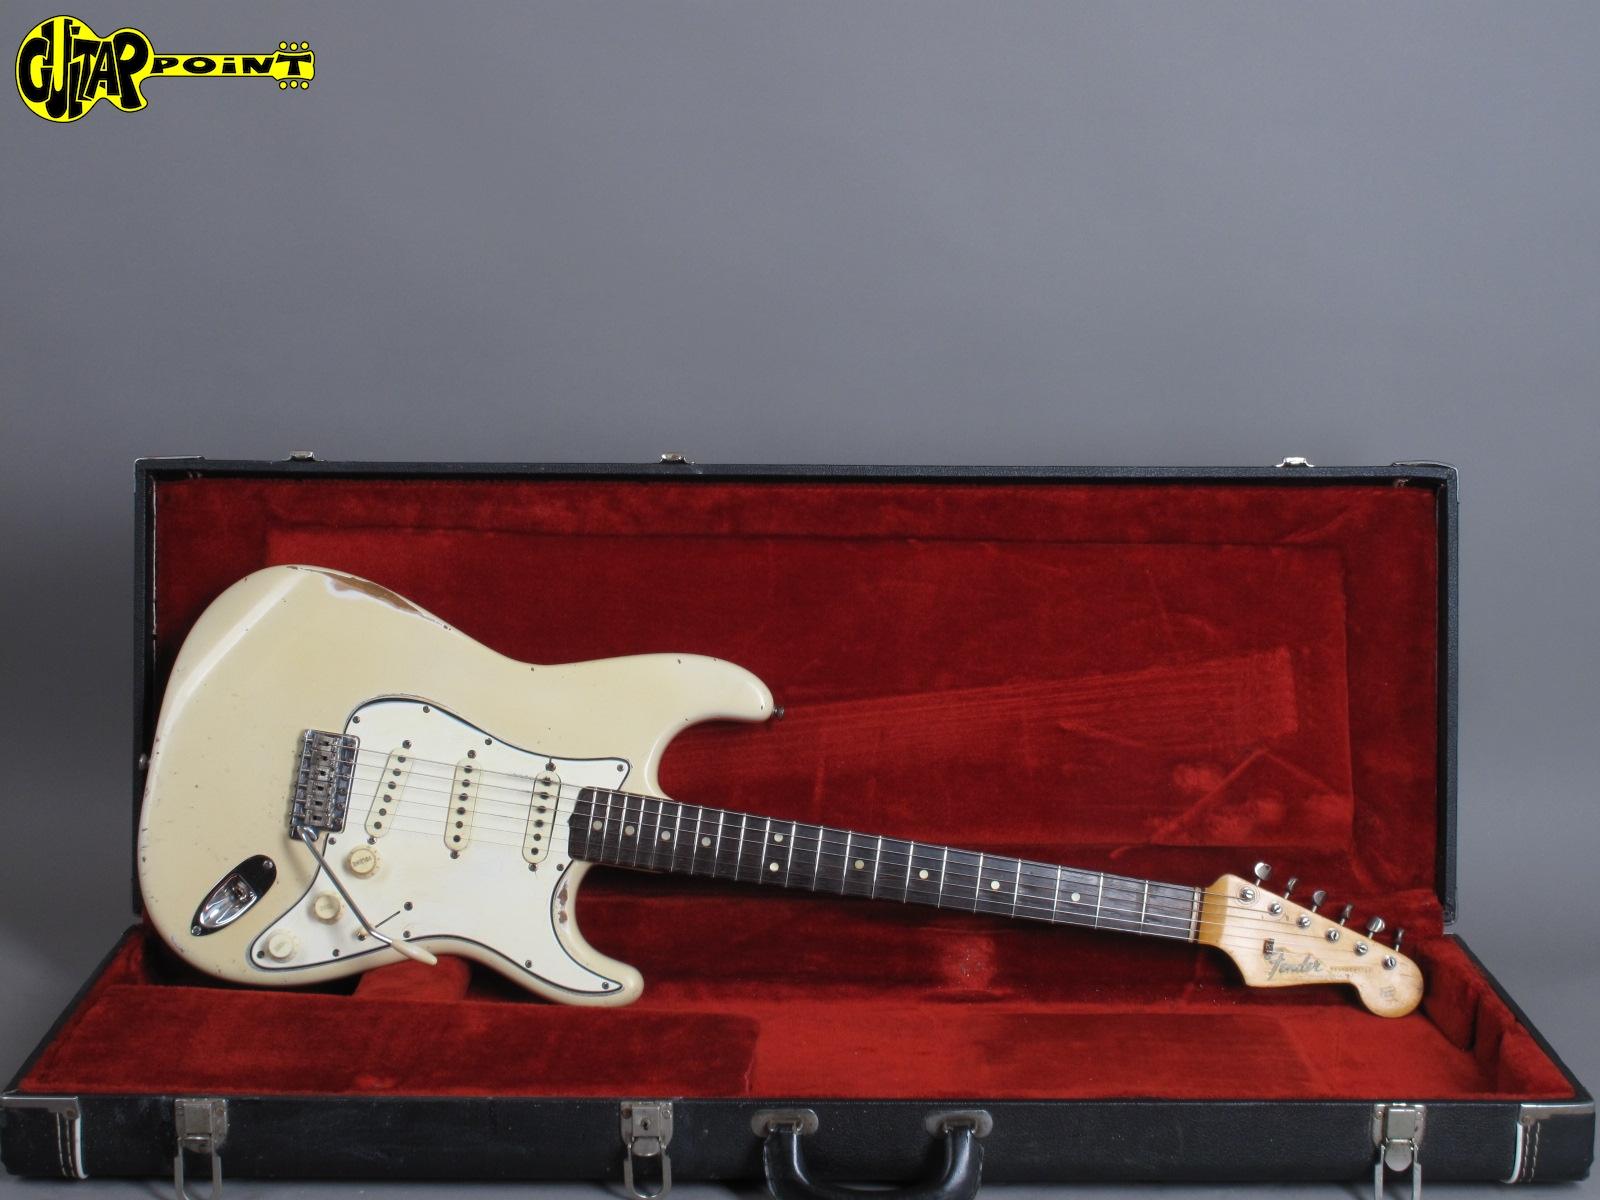 https://guitarpoint.de/app/uploads/products/1965-fender-stratocaster-olympic-white-refin/Fender65StrOW_L78233_4.jpg